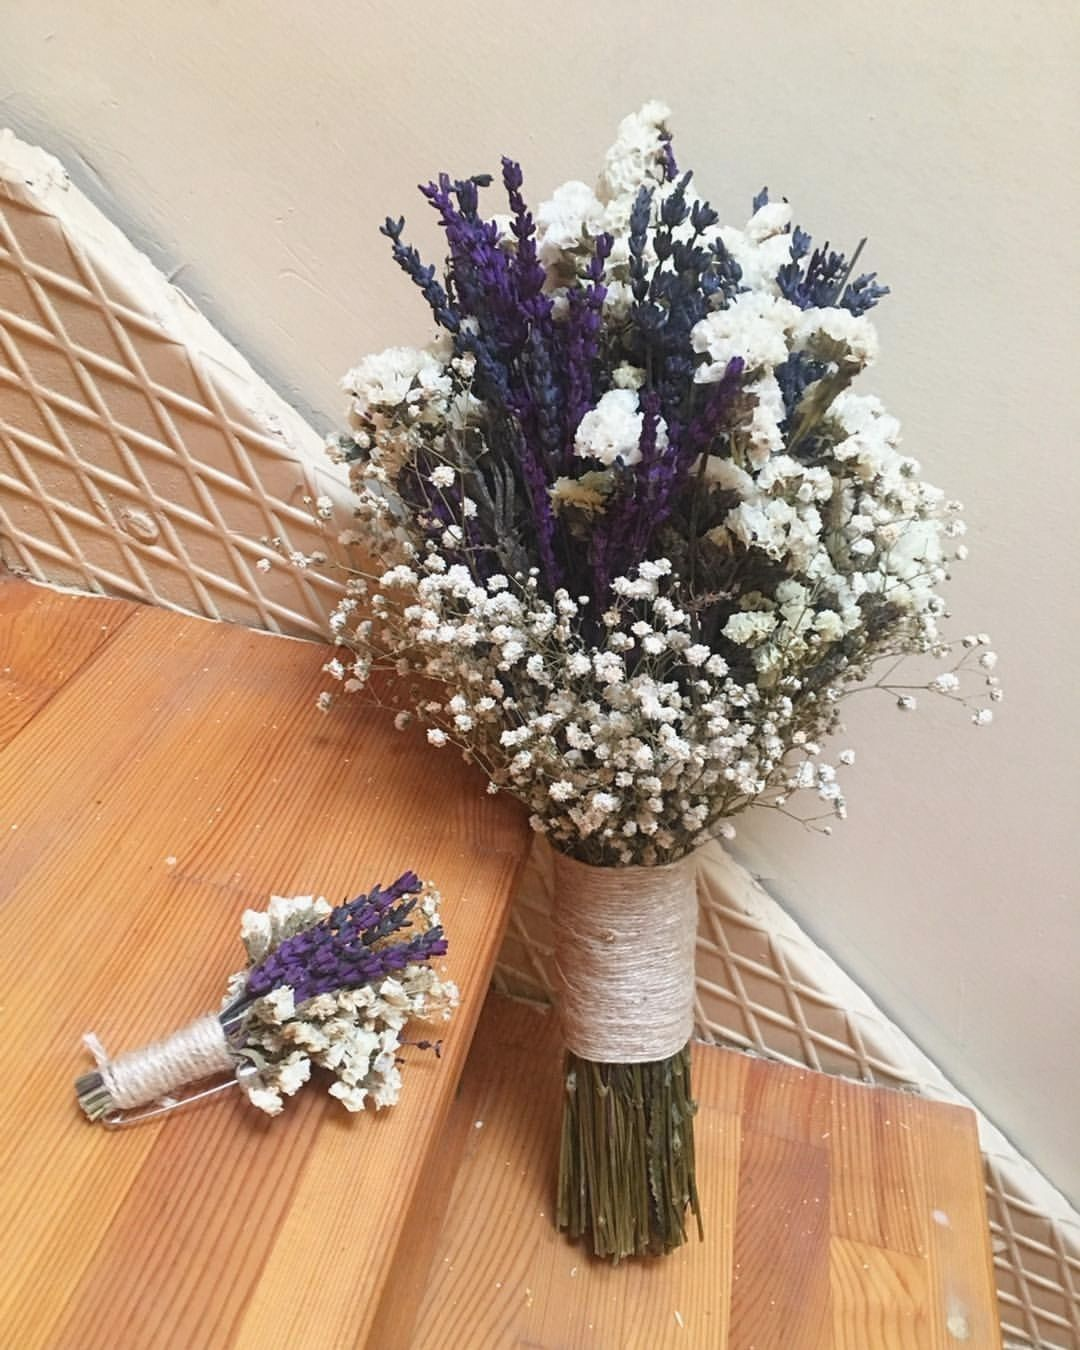 New The 10 Best Home Decor With Pictures Lavantanin Mevsimi Olmaz Her Mevsim En Zarifi Tugba Hanimin Siparisi Yola Hanukkah Wreath Wreaths Hanukkah